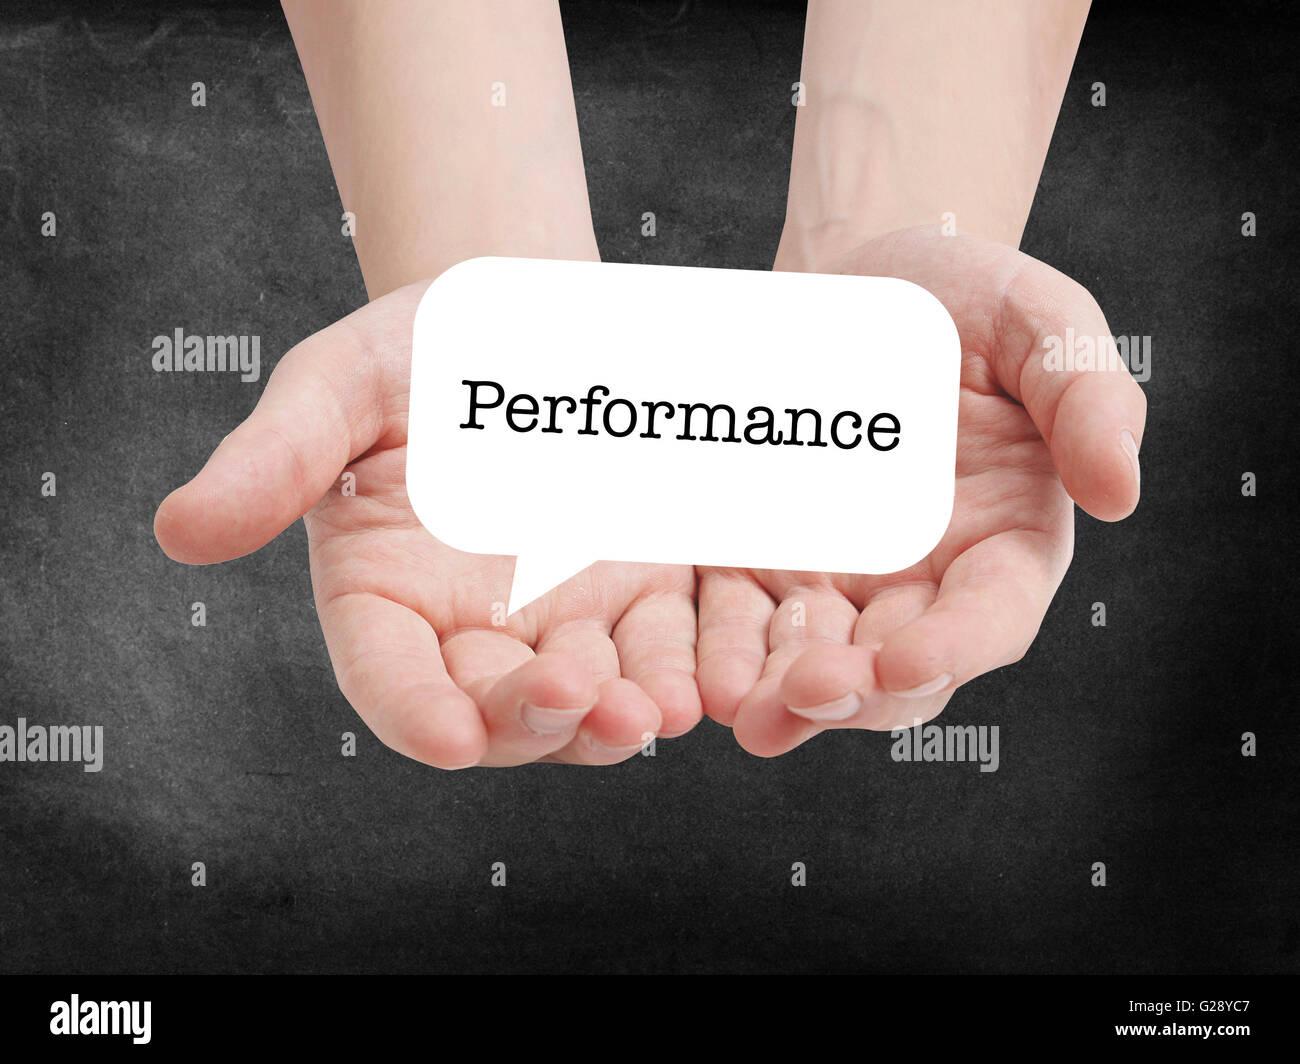 Performance written on a speechbubble - Stock Image